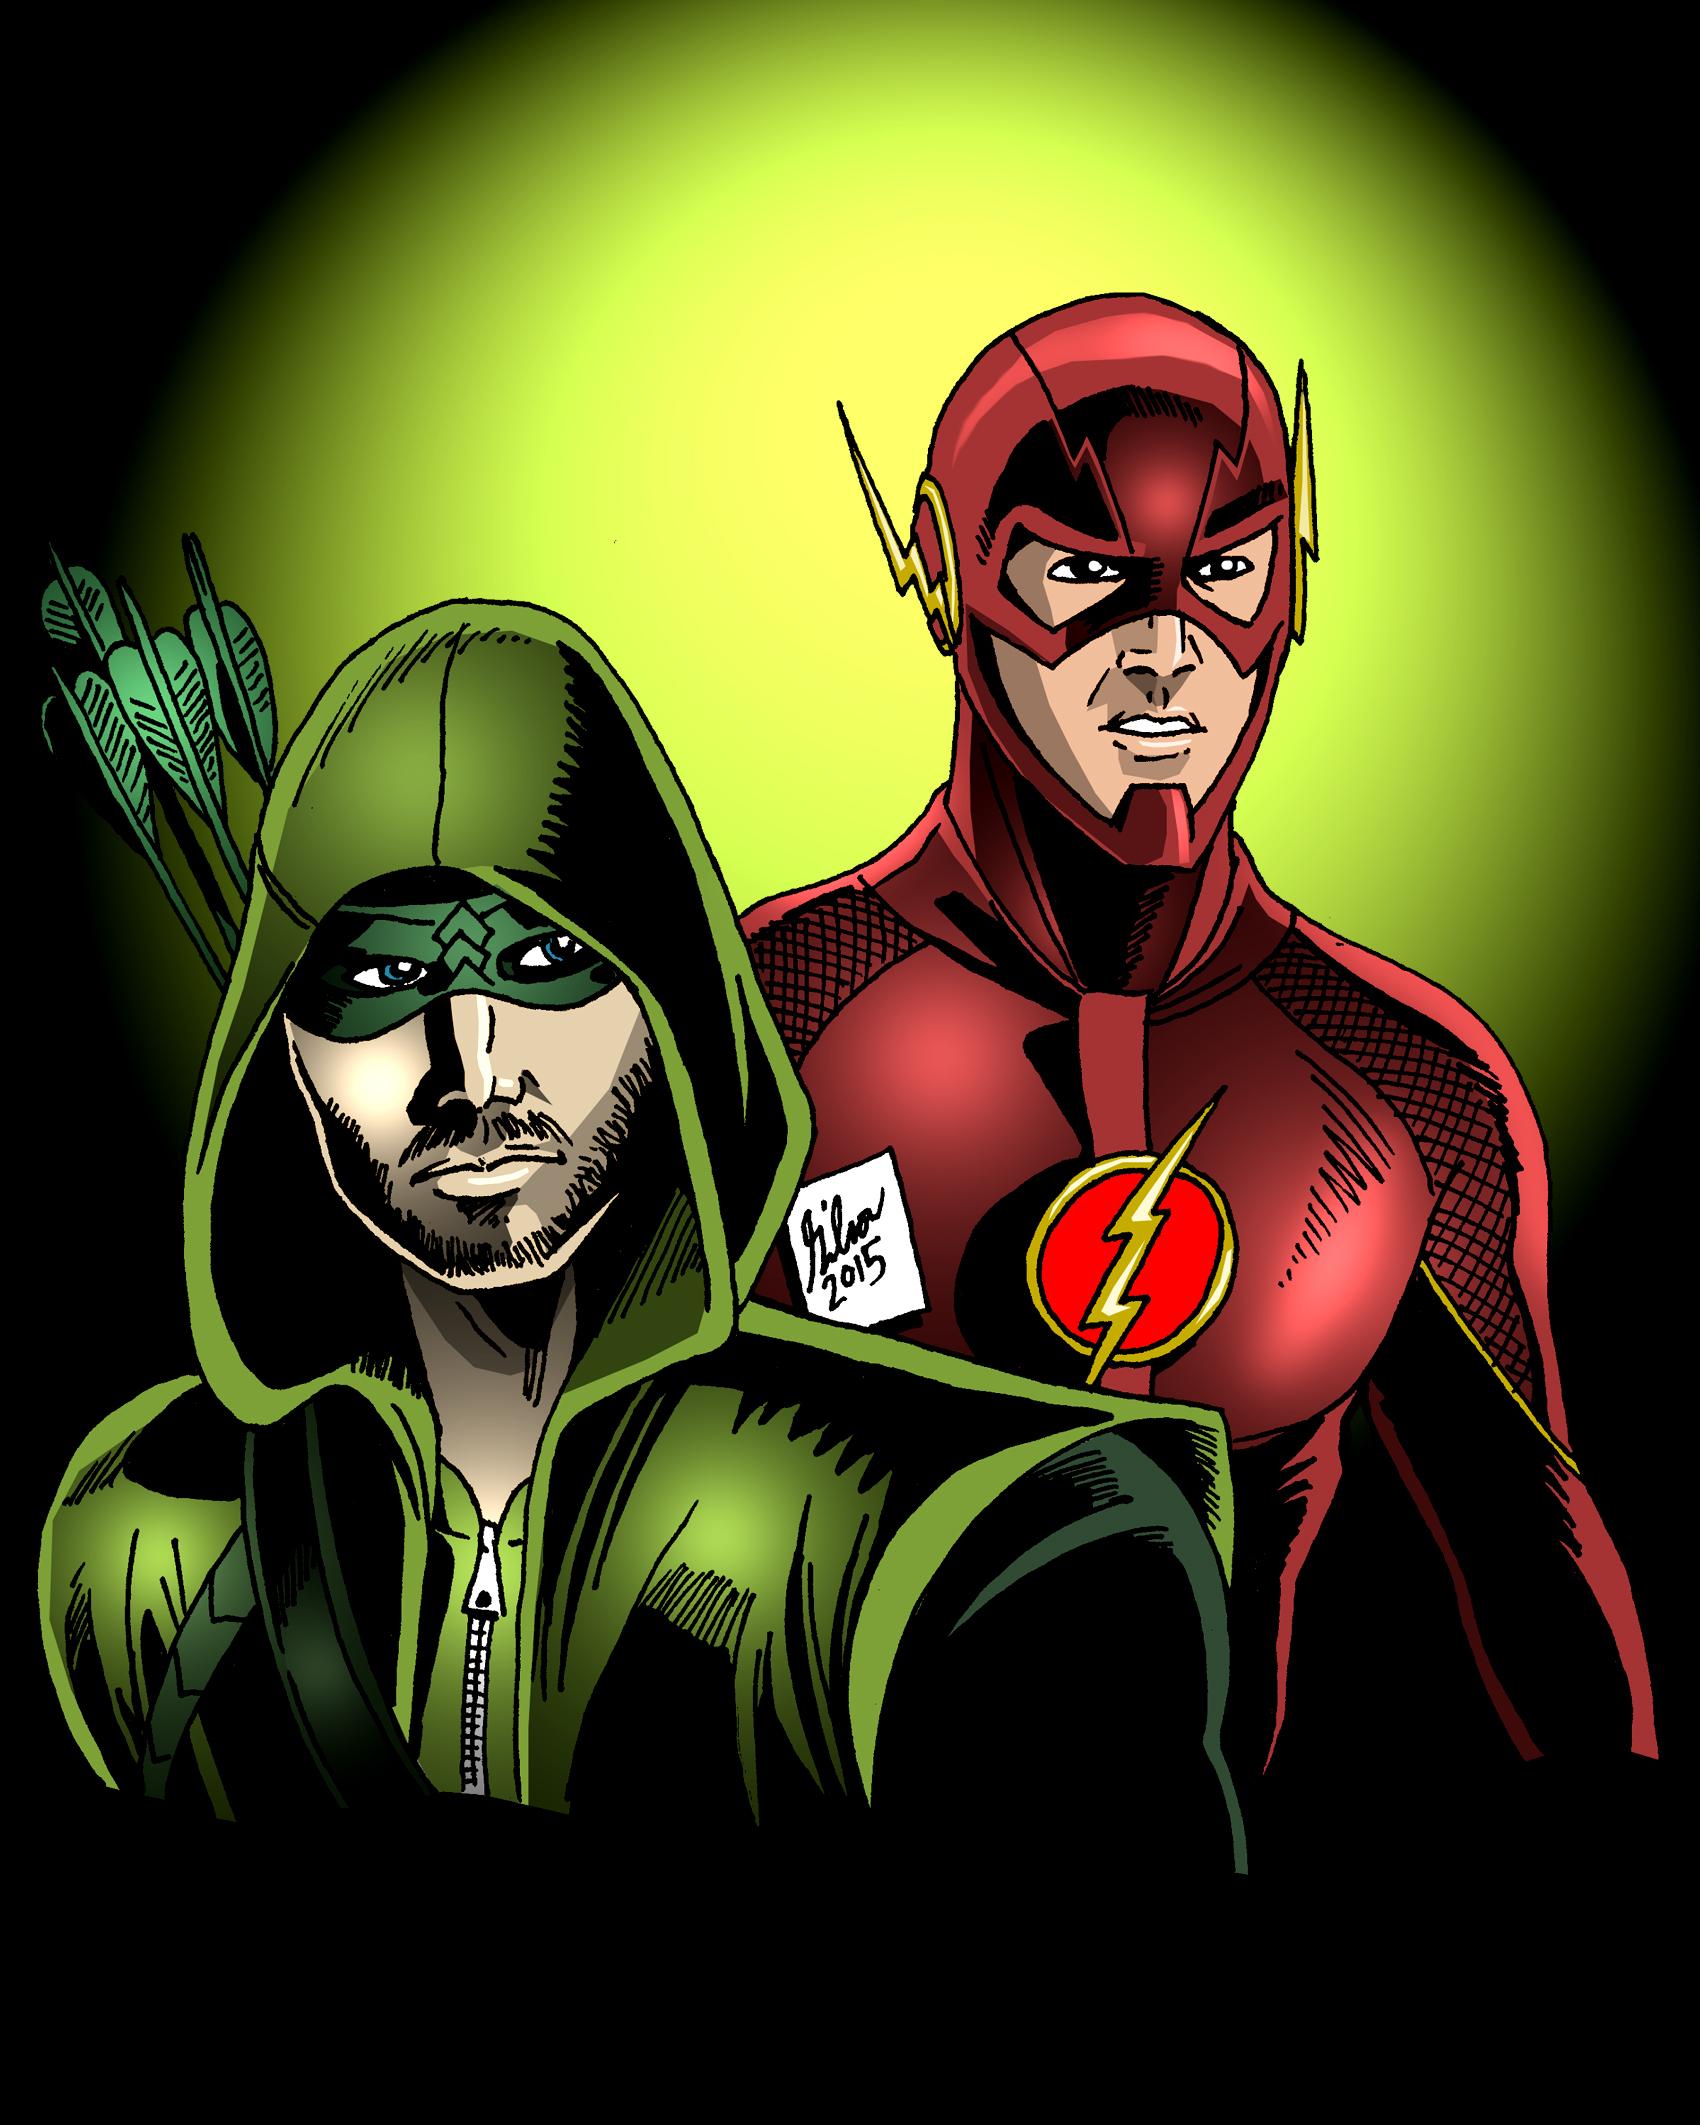 Arrow and Flash